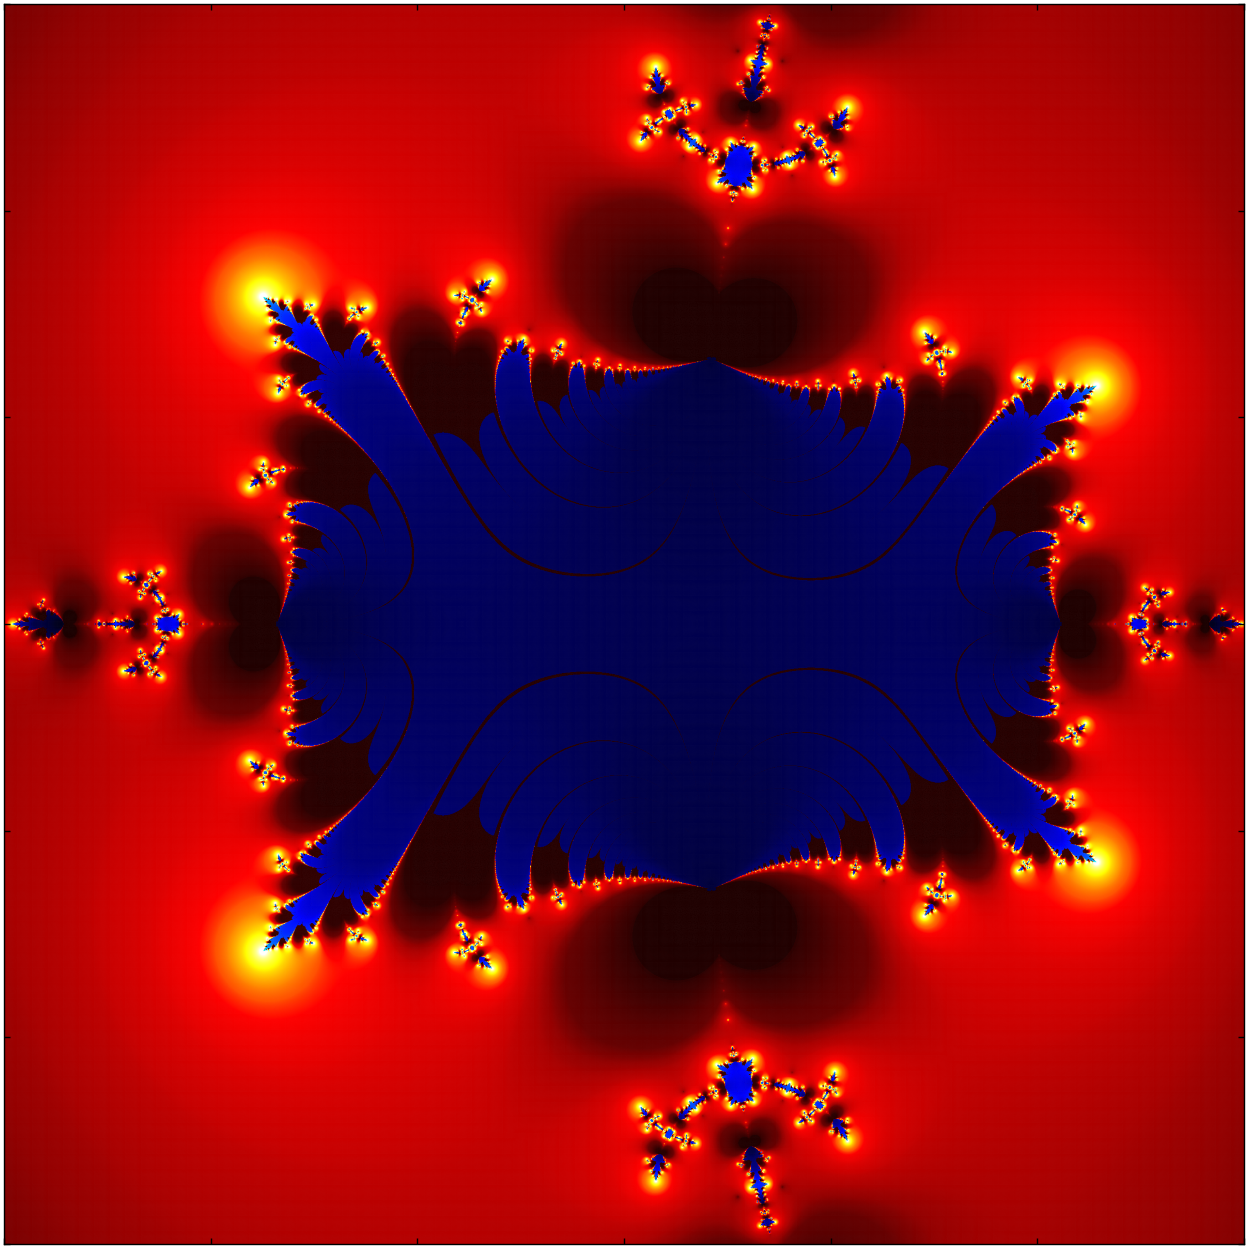 superfine_second_swimmer_filament_detail